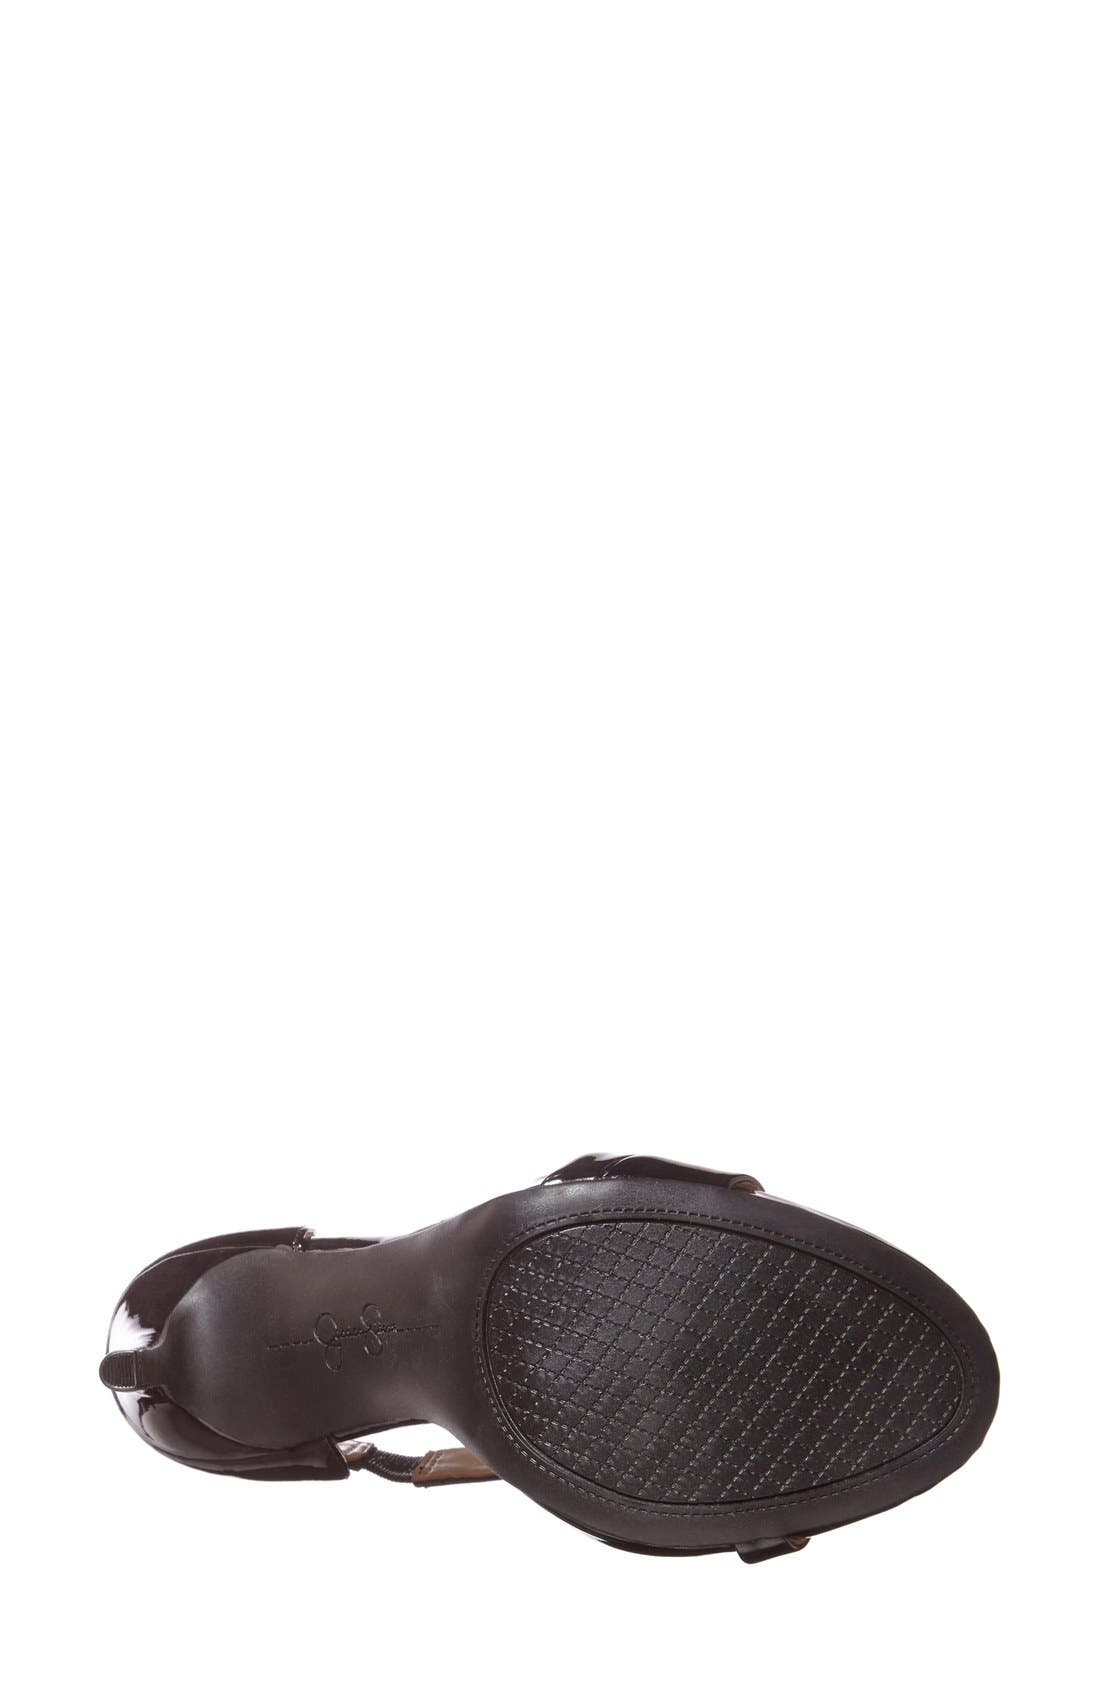 'Rayli' Patent Ankle Strap Sandal,                             Alternate thumbnail 2, color,                             001